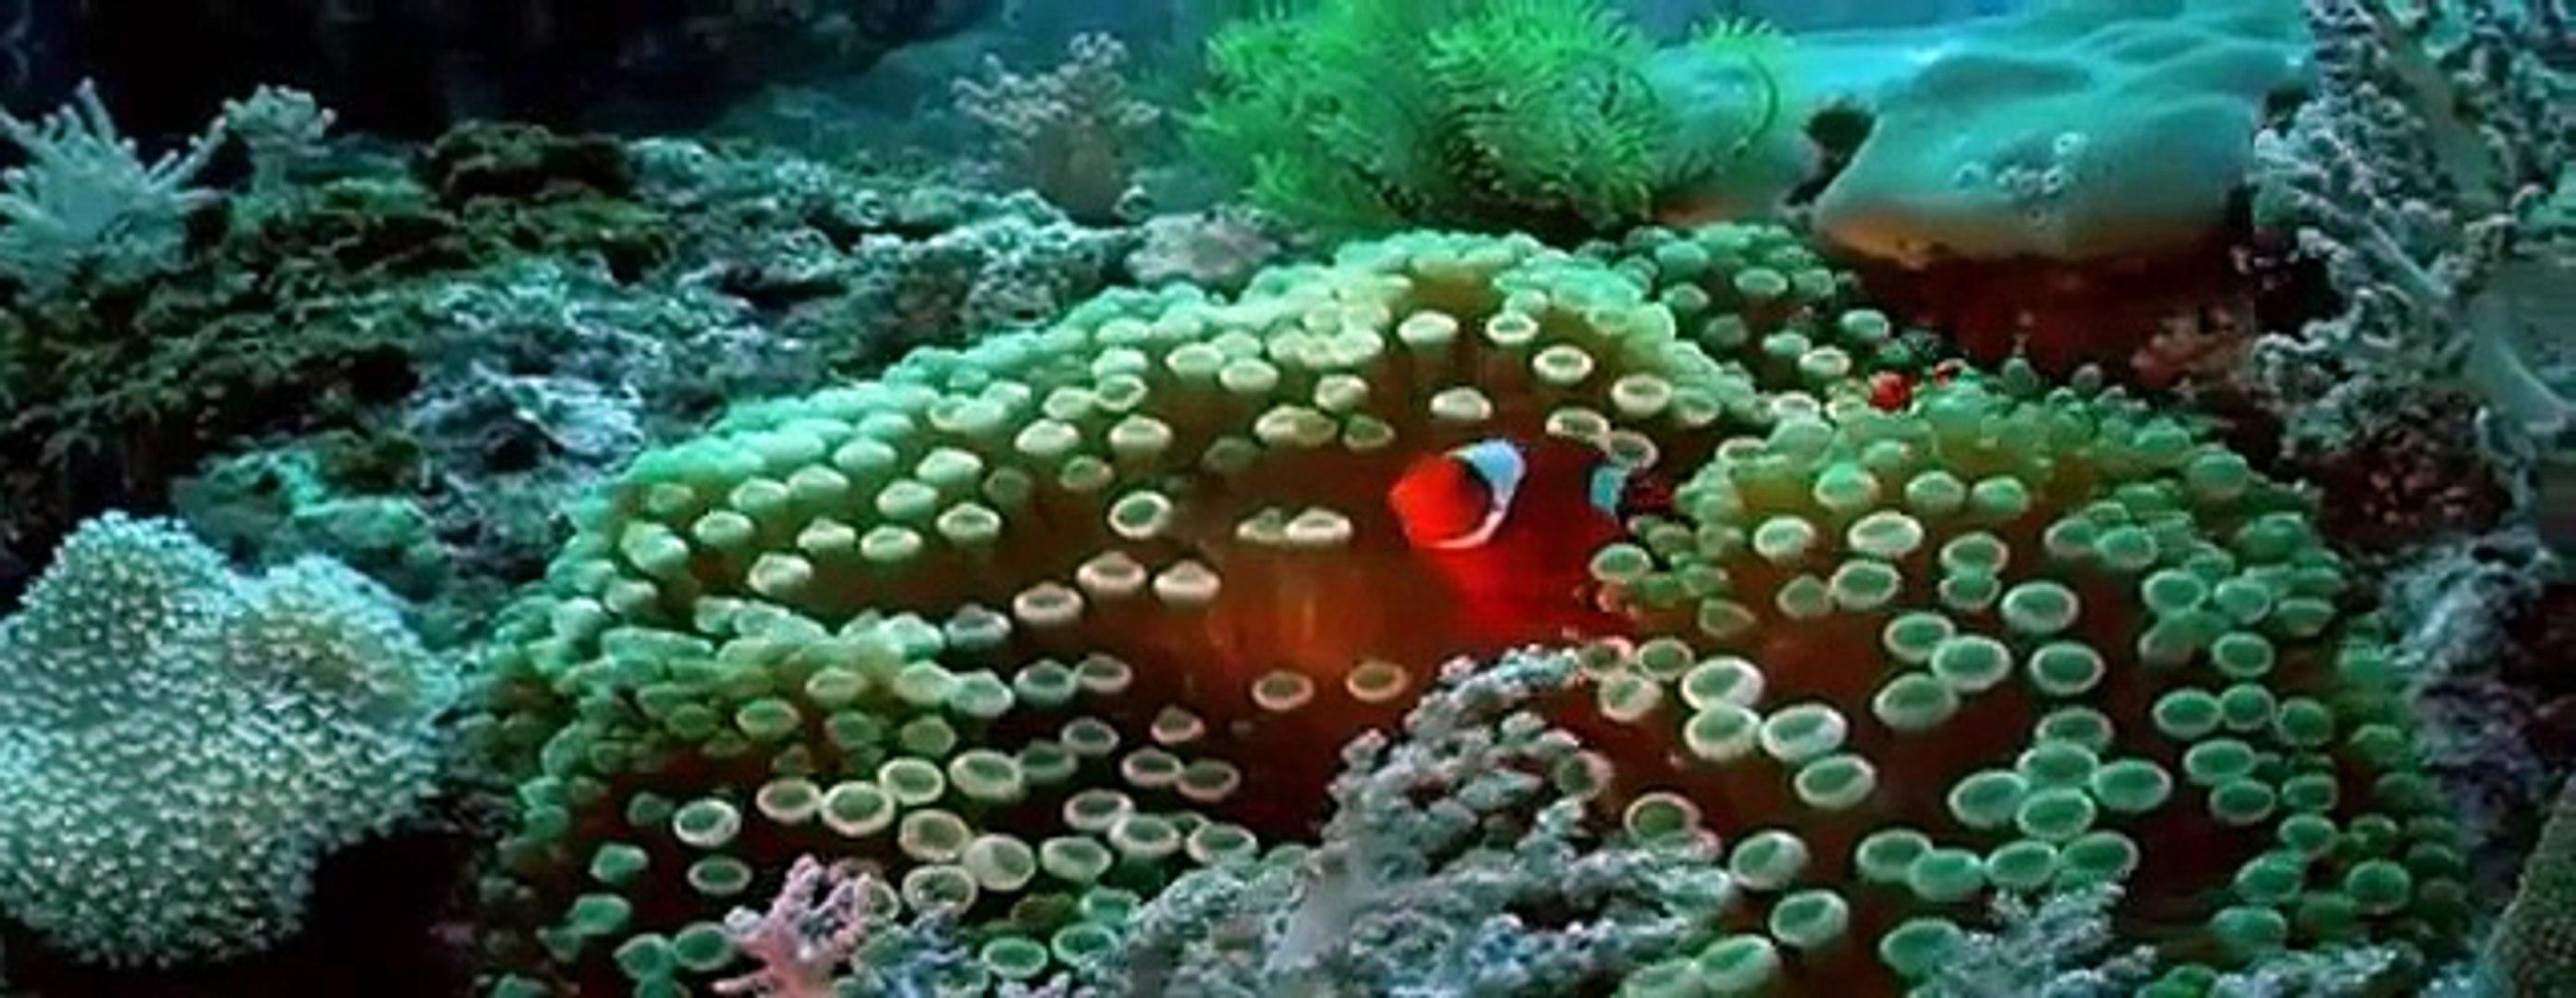 Clown Fish - My animal friends - Animals Documentary -Kids educational Videos